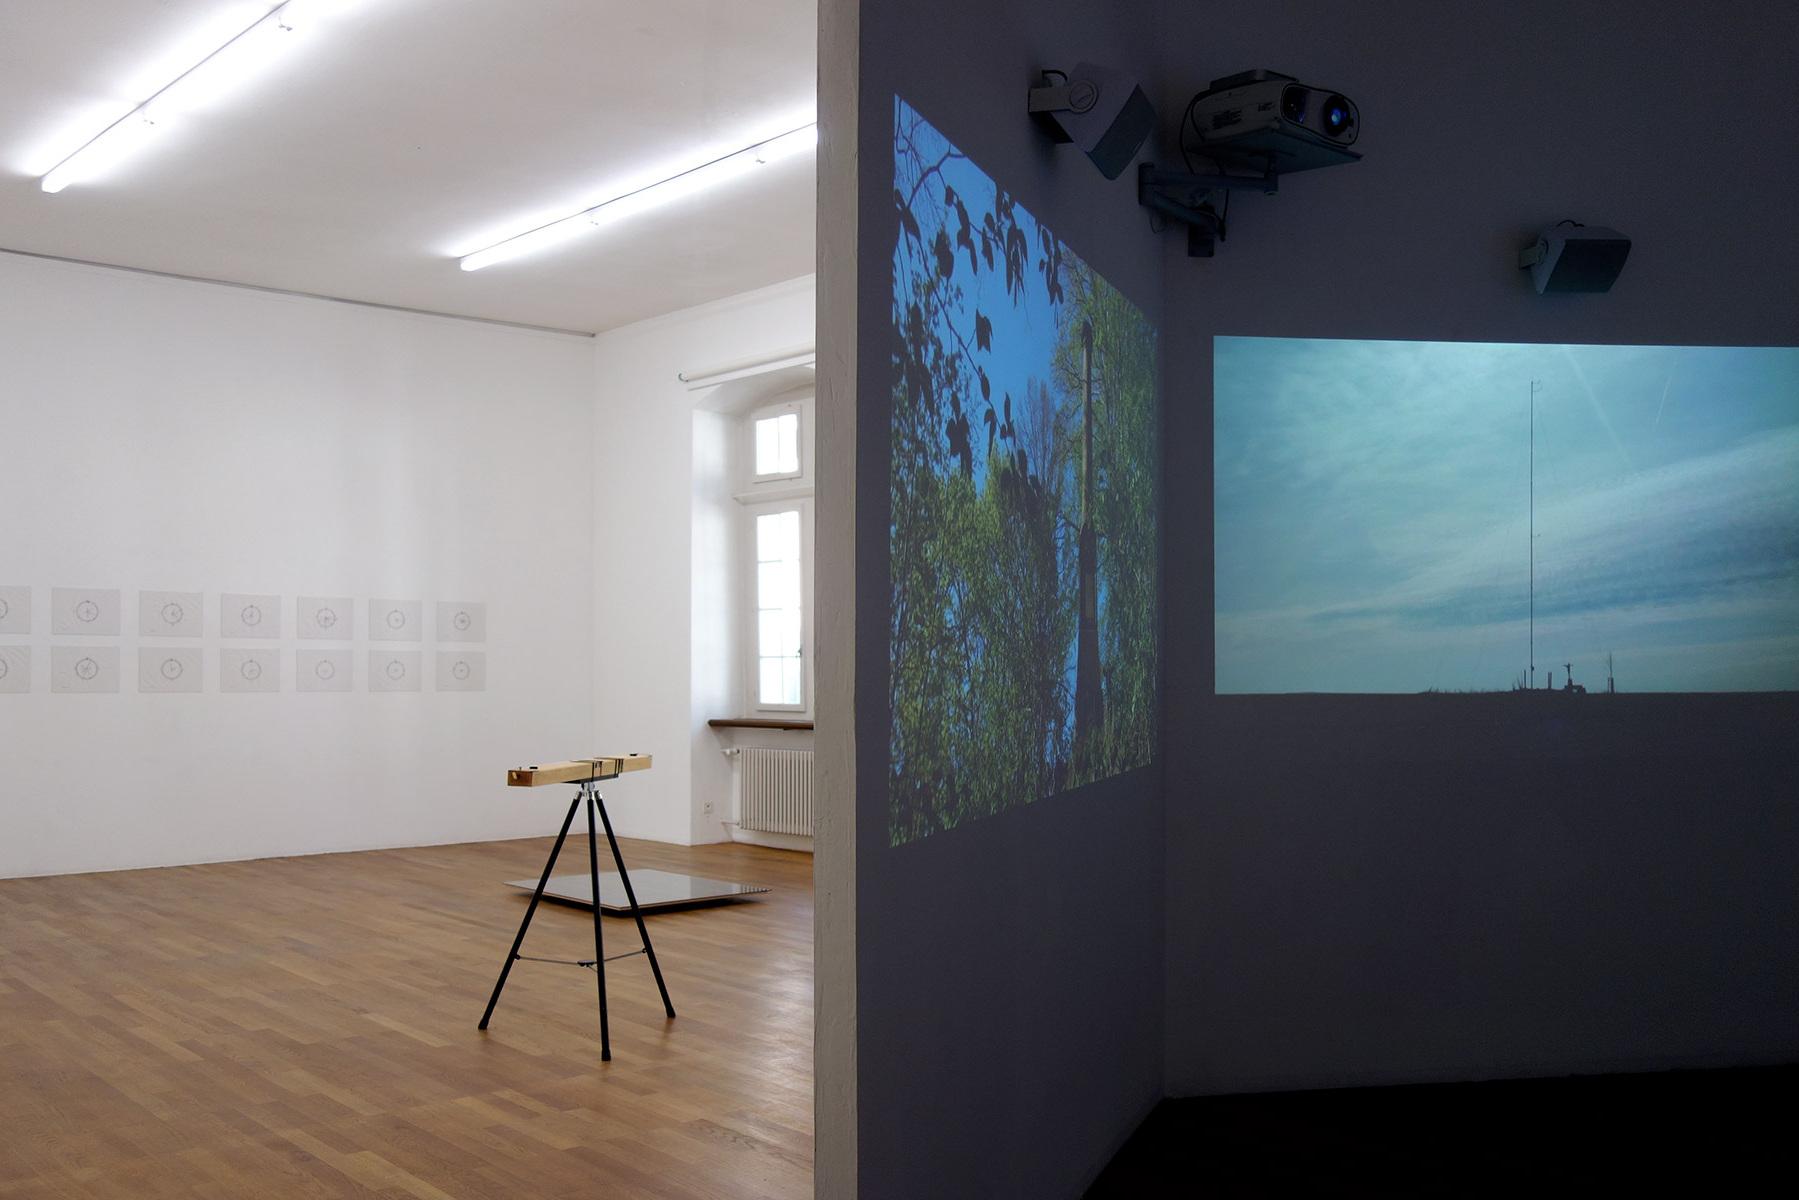 Bignia-Wehrli-Kunsthalle-Winterthur-2018